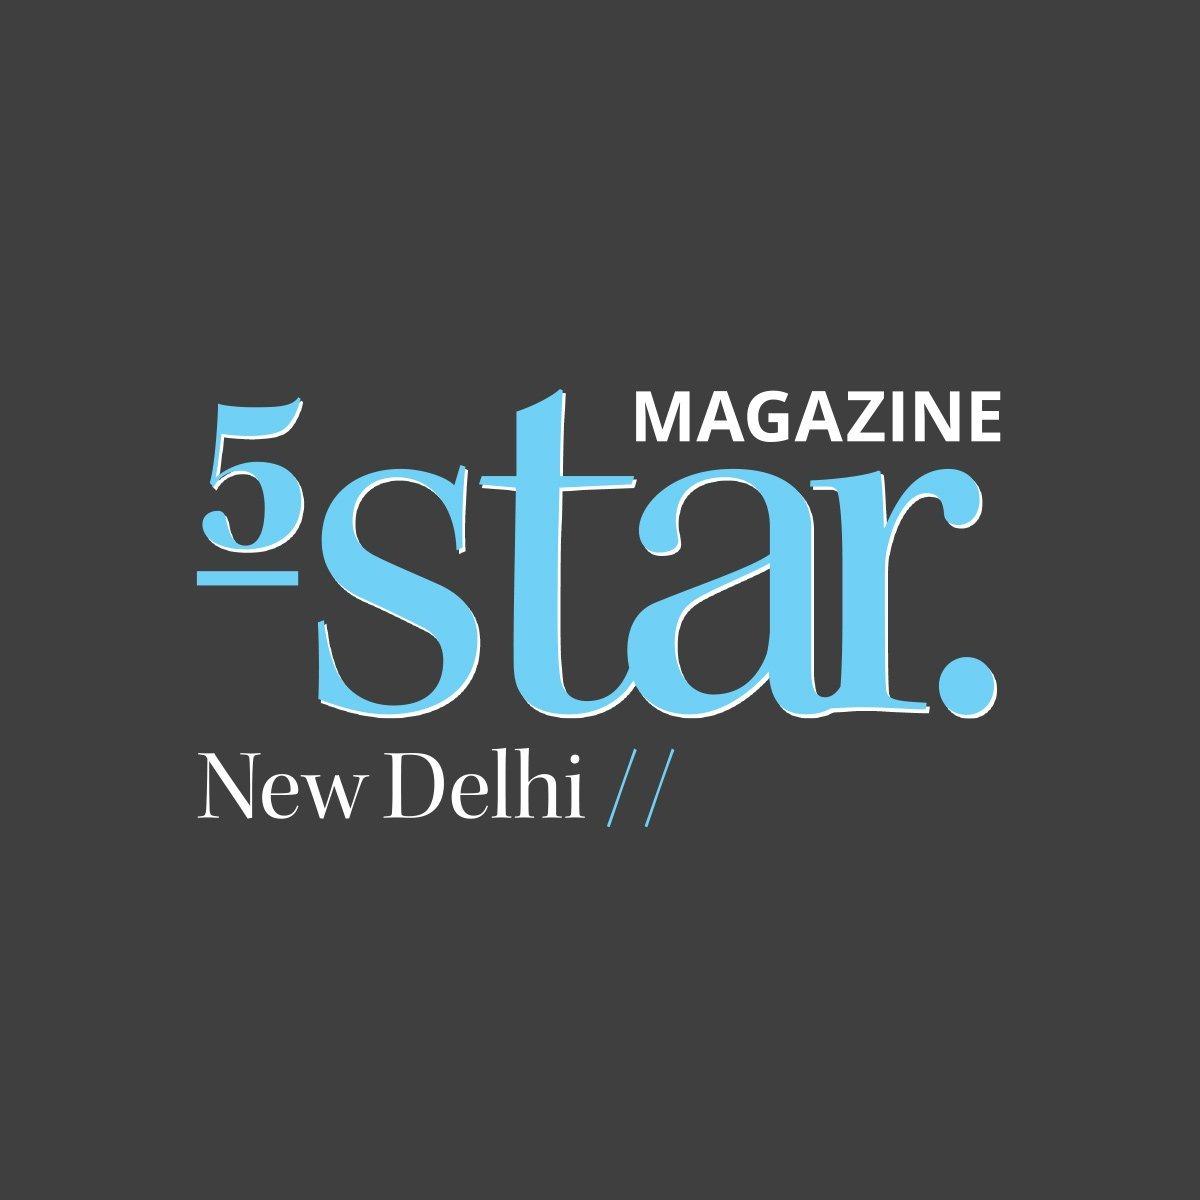 5Star Magazine Masthead